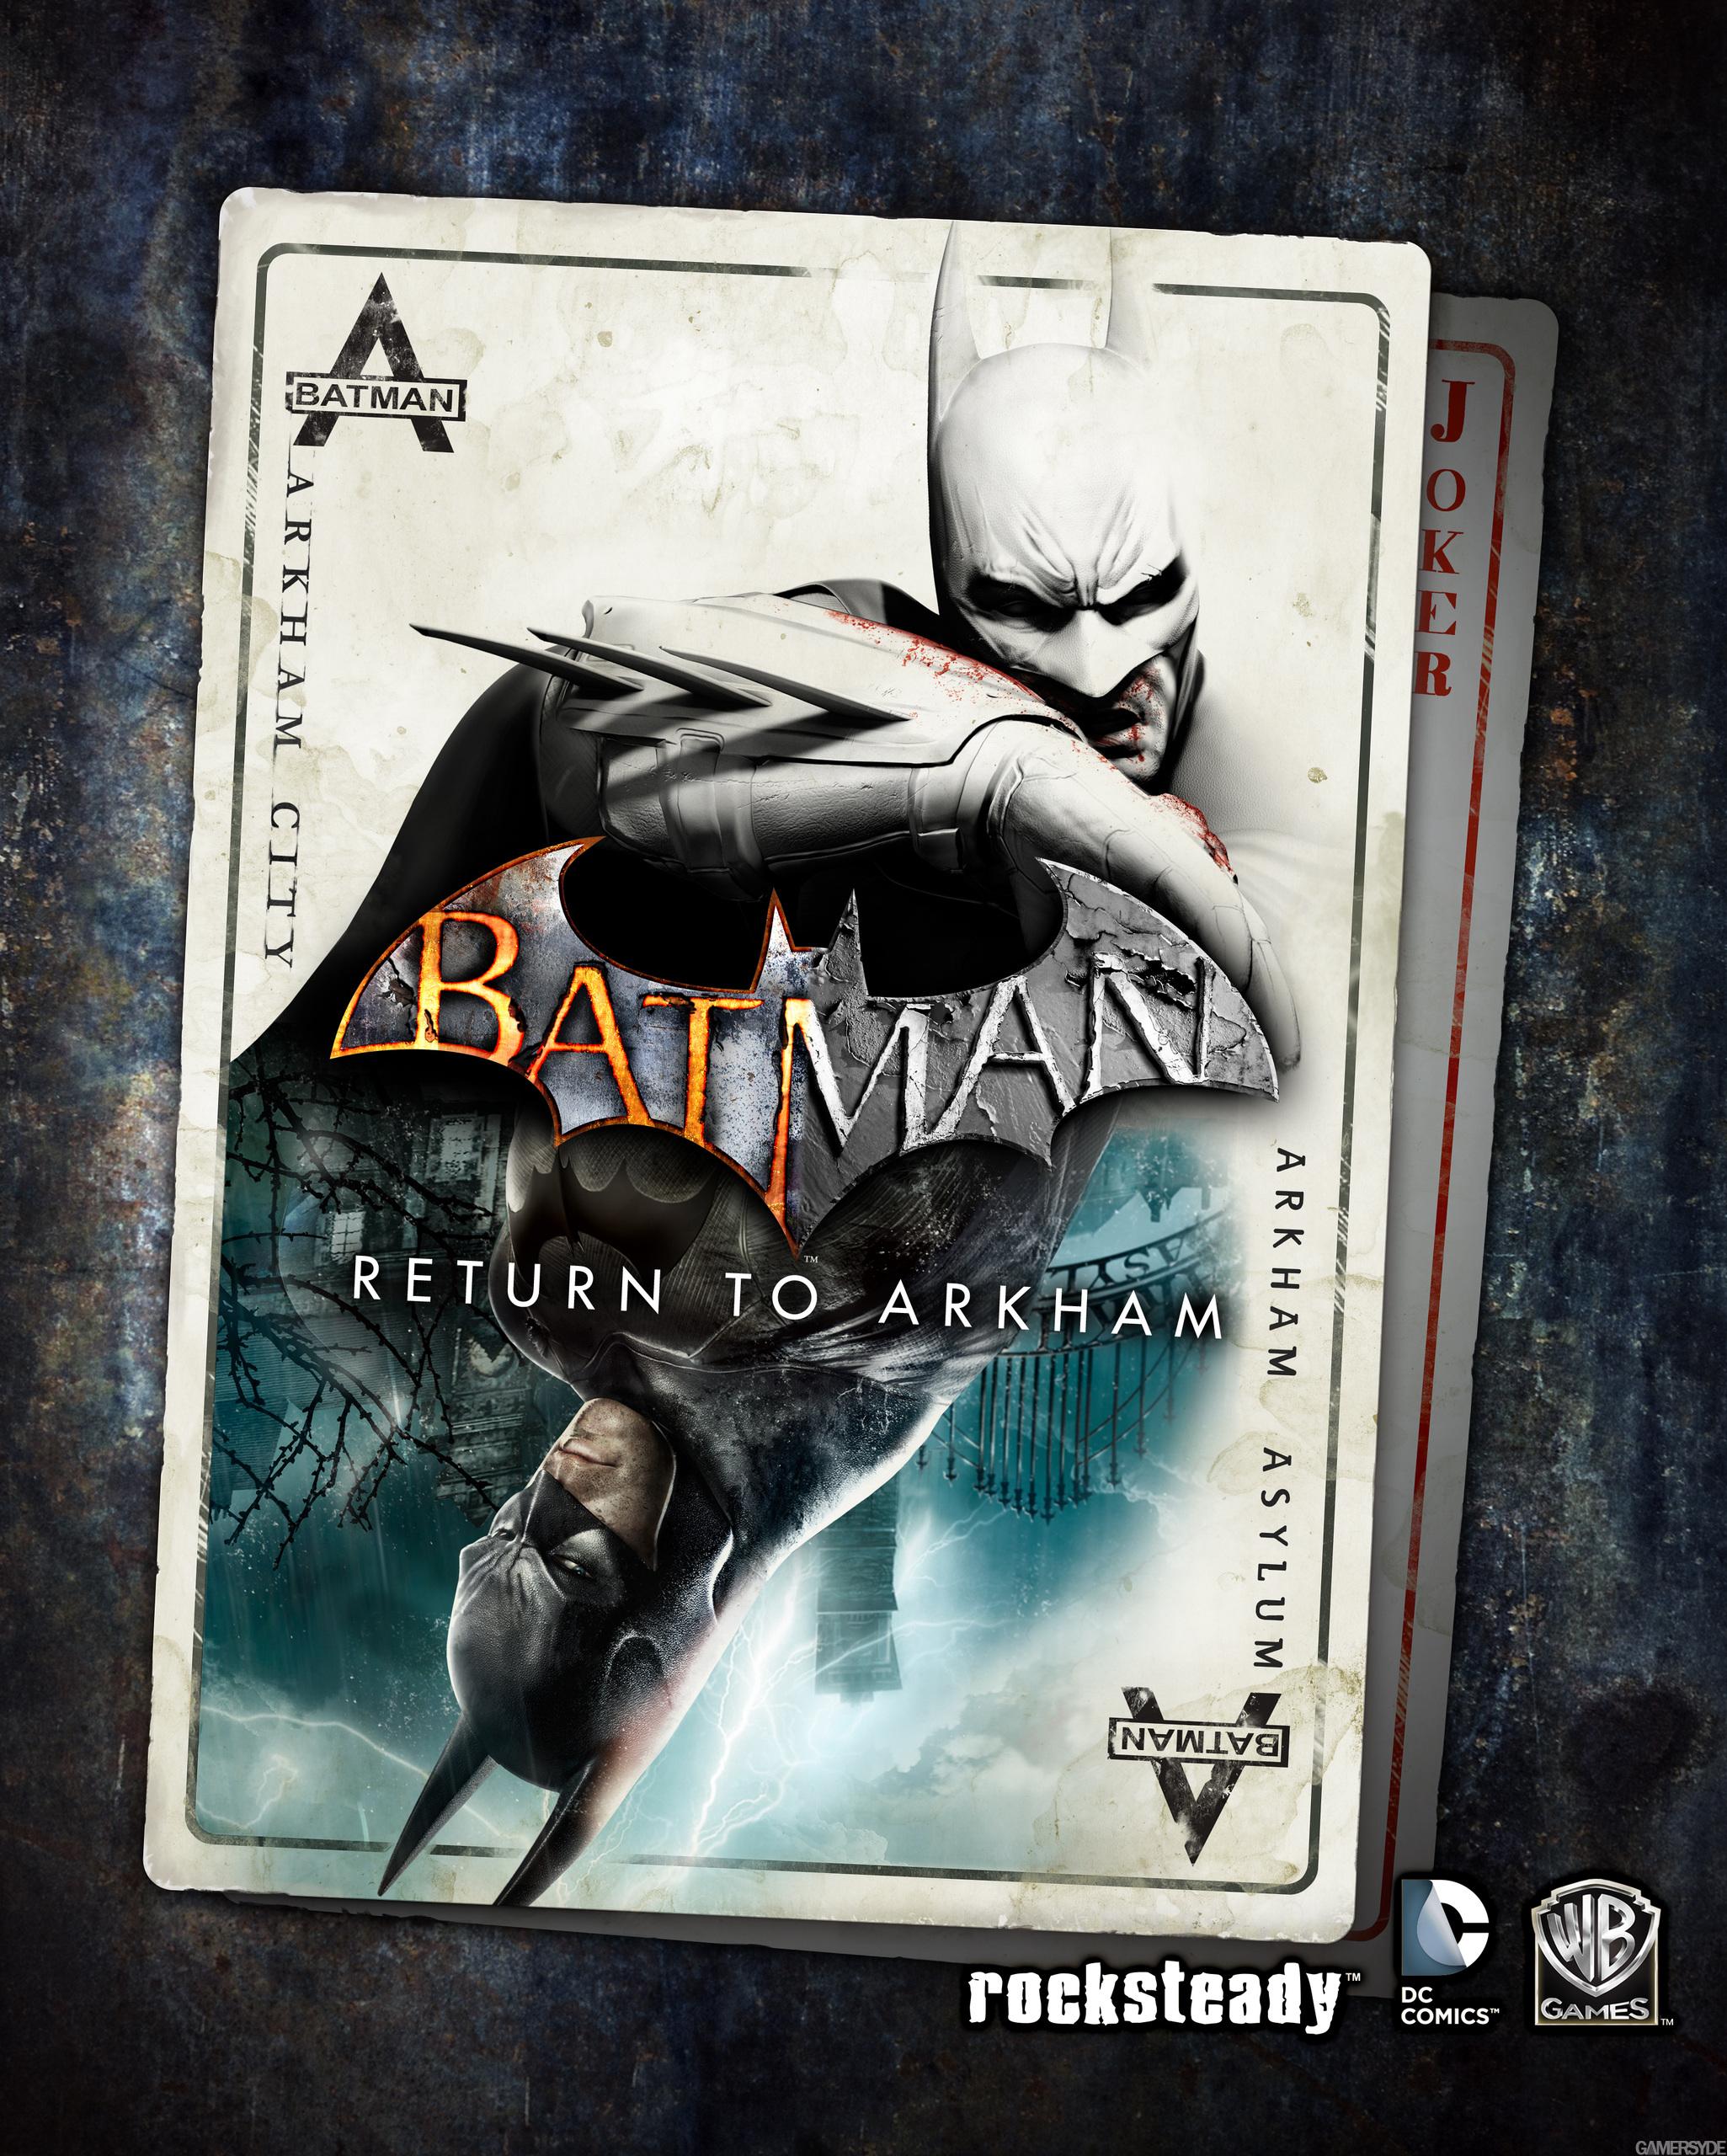 image_batman_return_to_arkham-31785-3591_0001